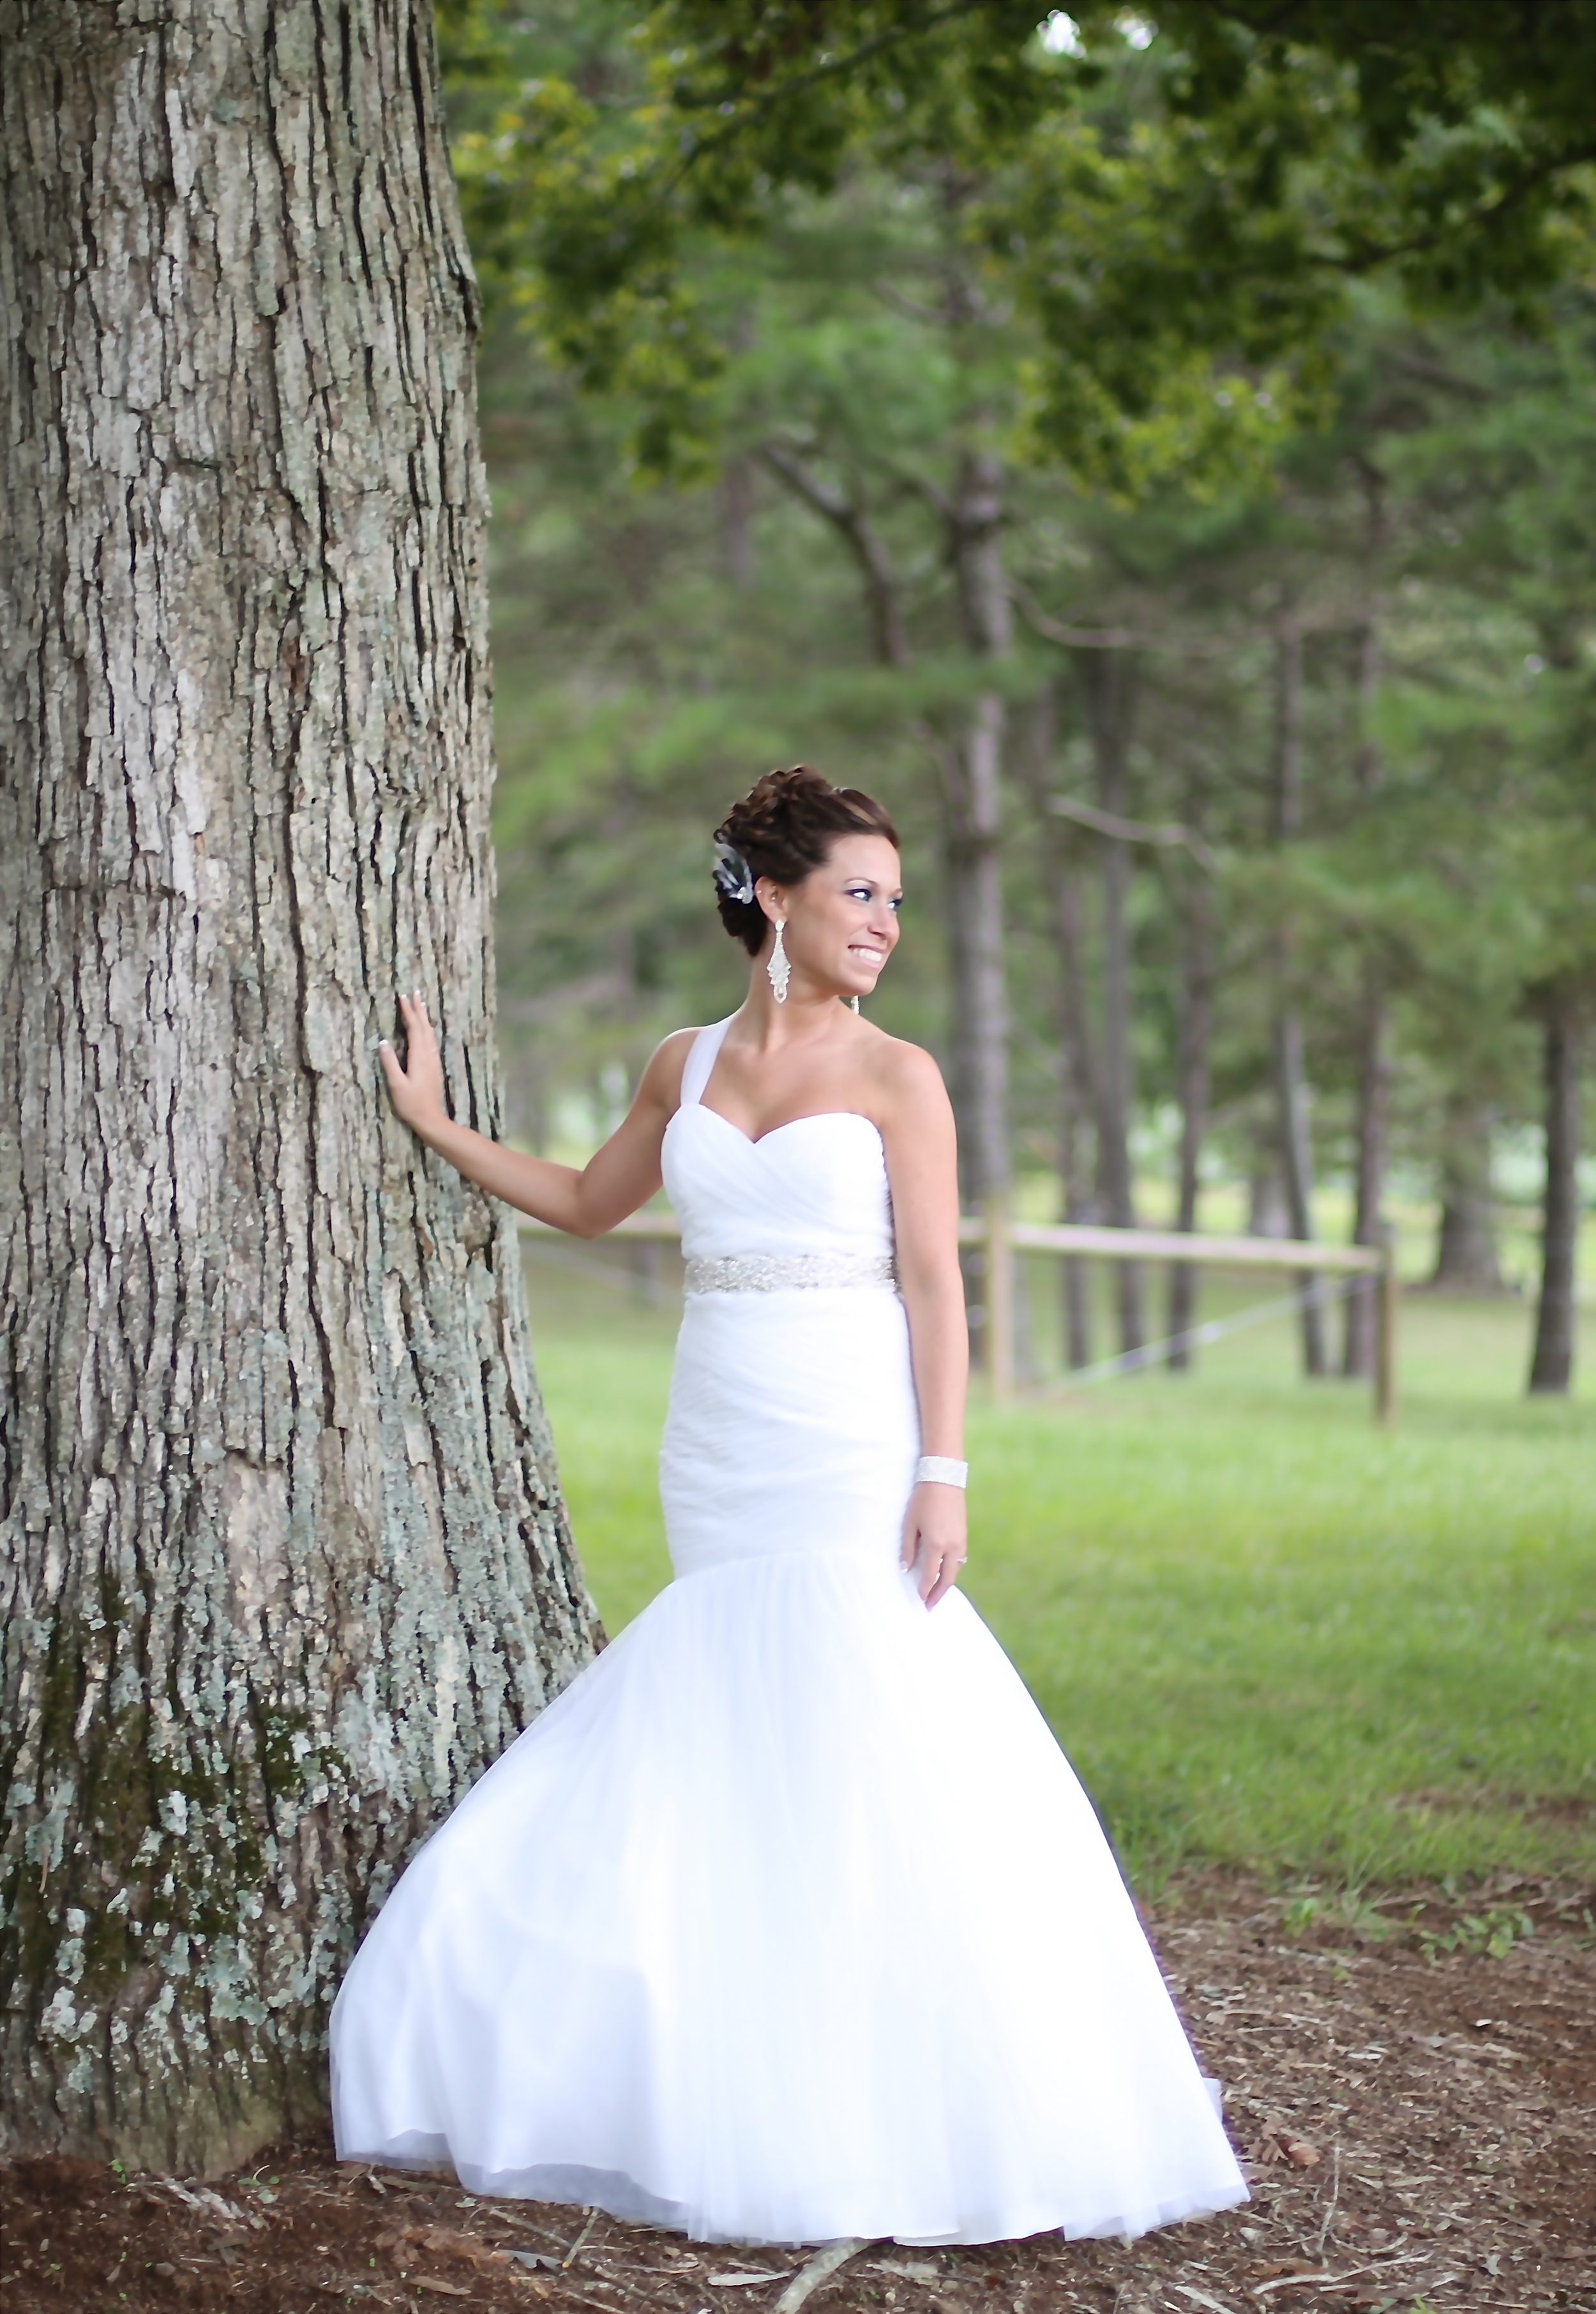 joanna bridal shoot 19